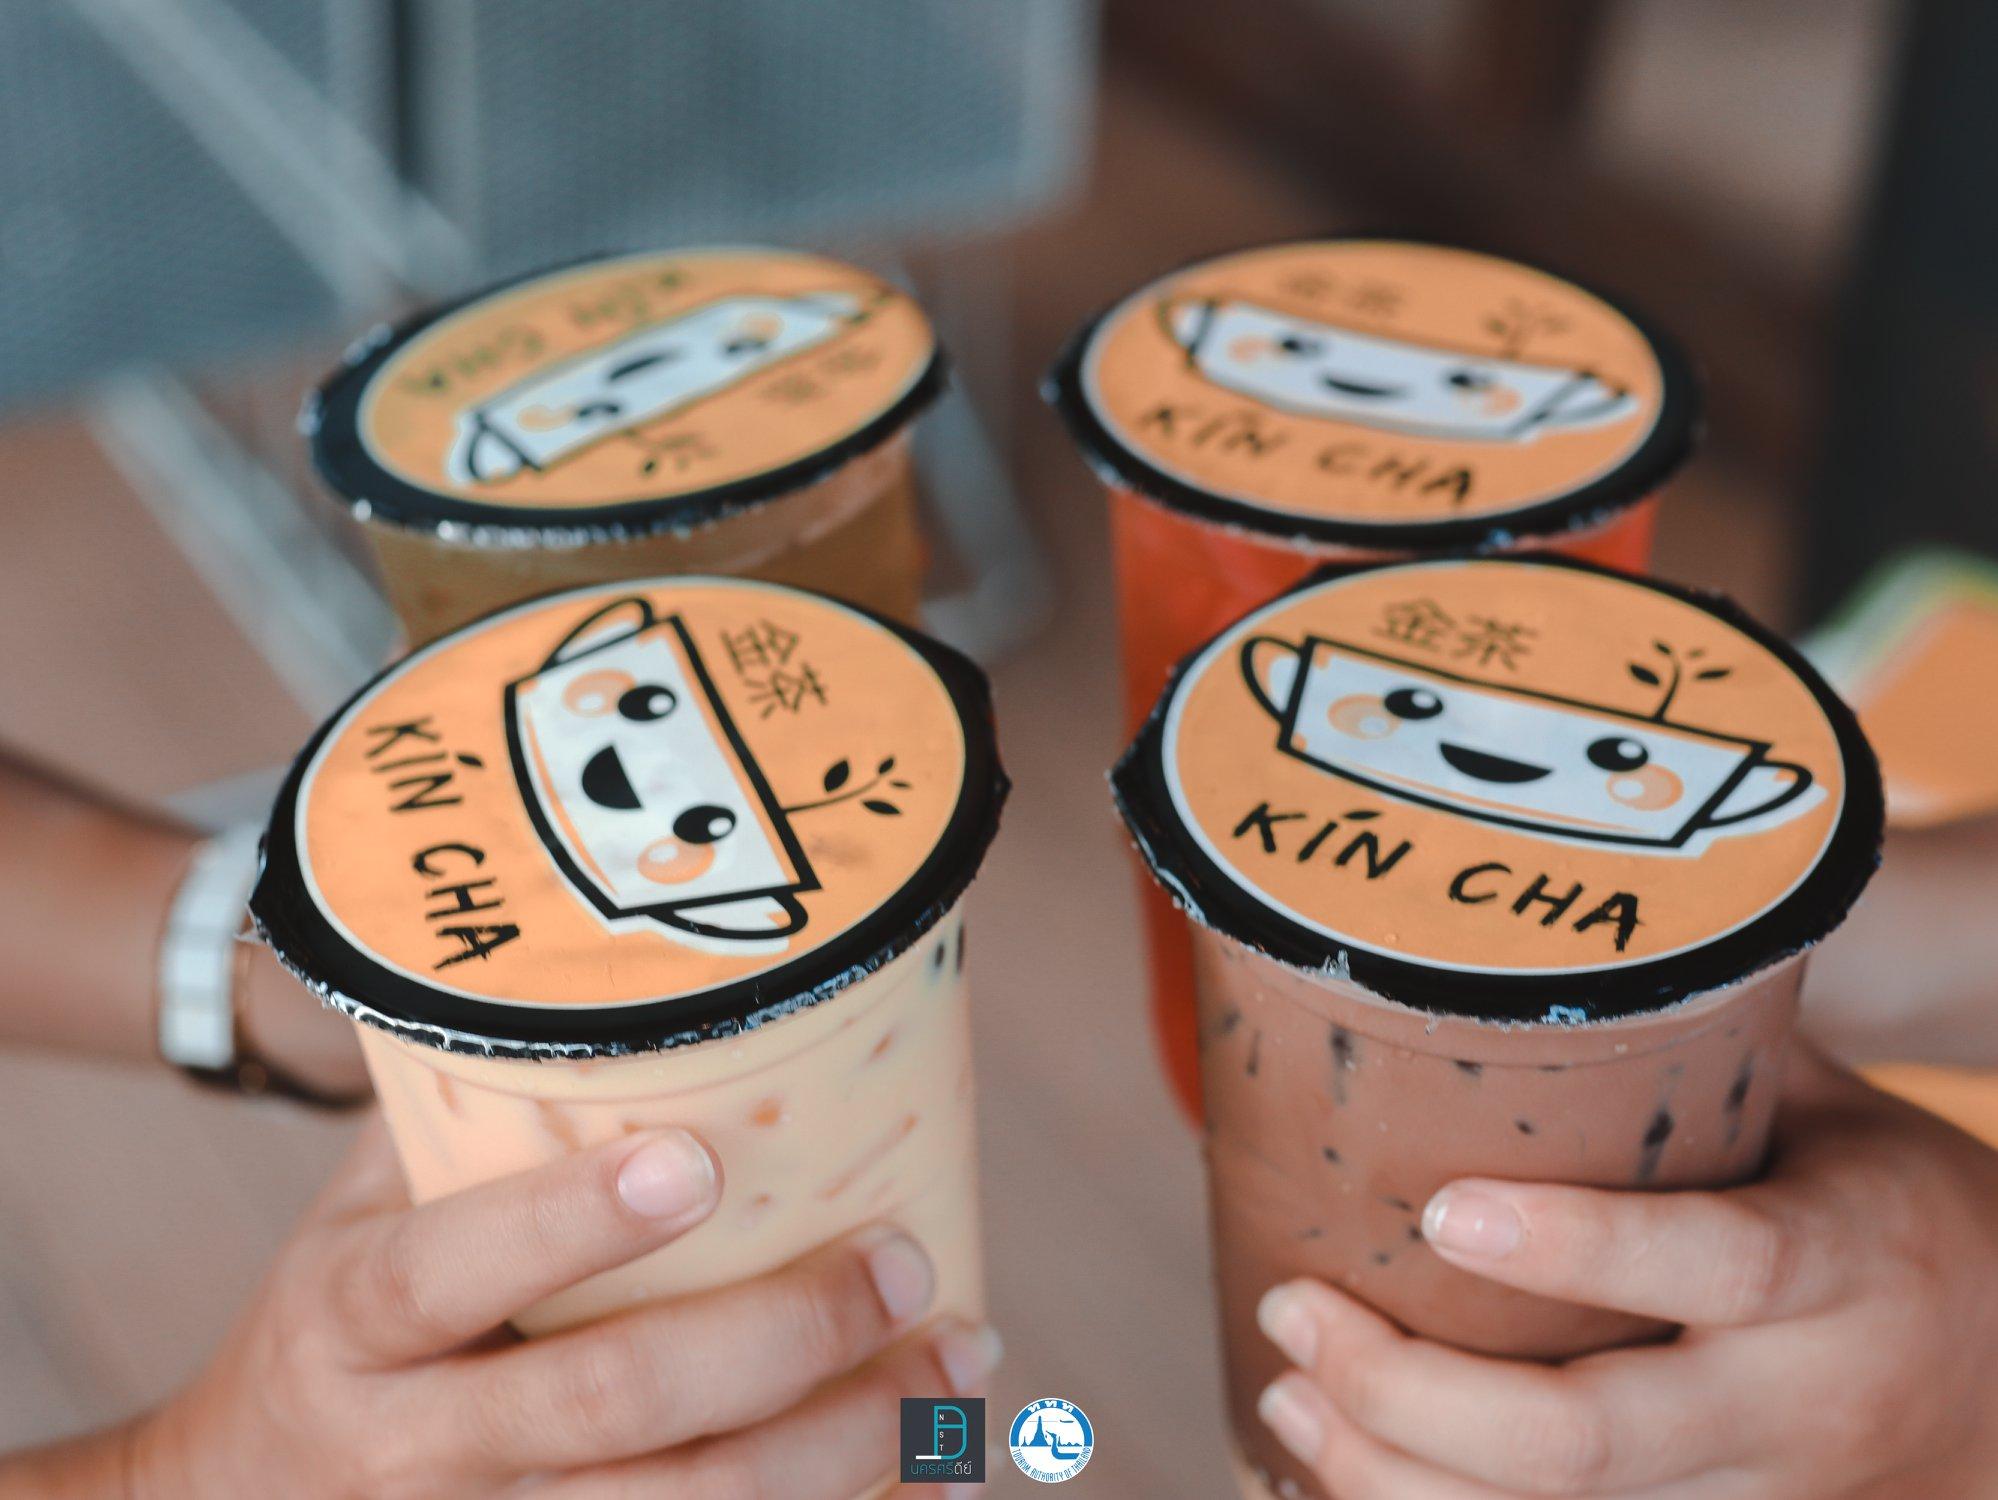 13.-KinCha-ร้านชาไข่มุก-ที่เมนูโกโก้ก็เด็ดเช่นกันครับ-รสชาติเบาๆสบายๆ โกโก้,นครศรีธรรมราช,อร่อย,ergo,coffee,ของกิน,เครื่องดื่ม,คาเฟ่